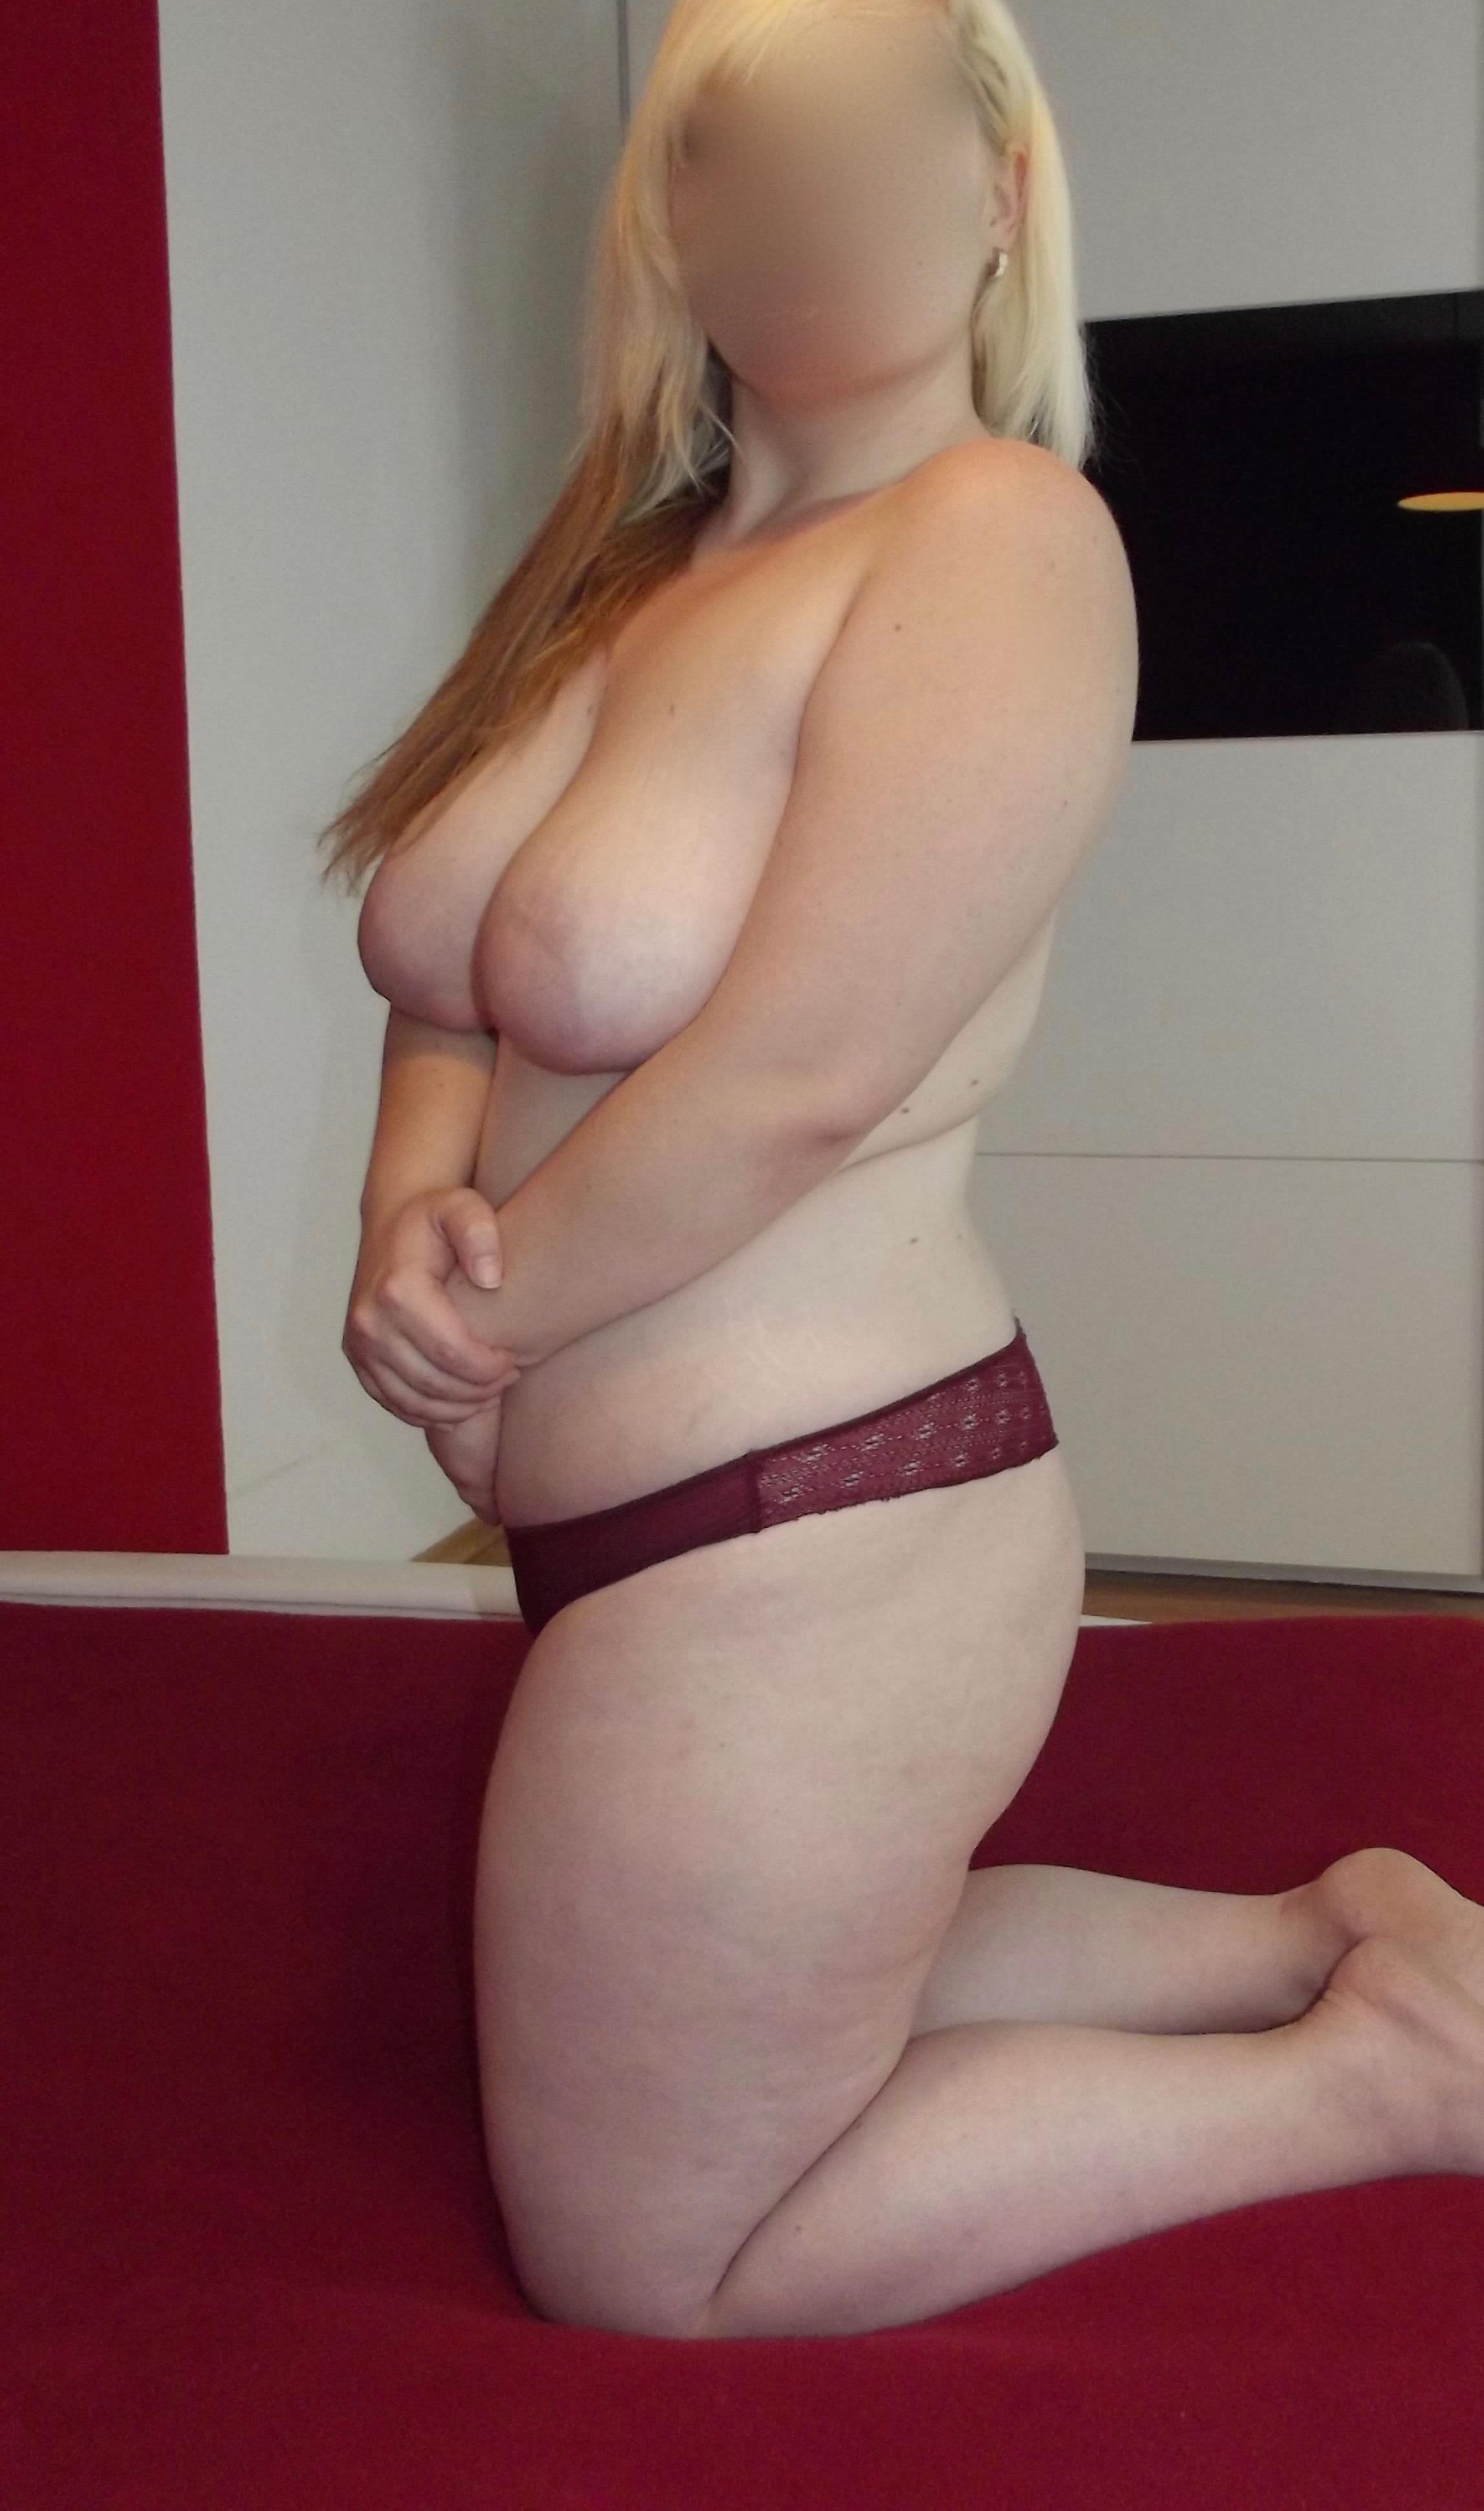 SEX PRAHA FREE FOTO VIDEO